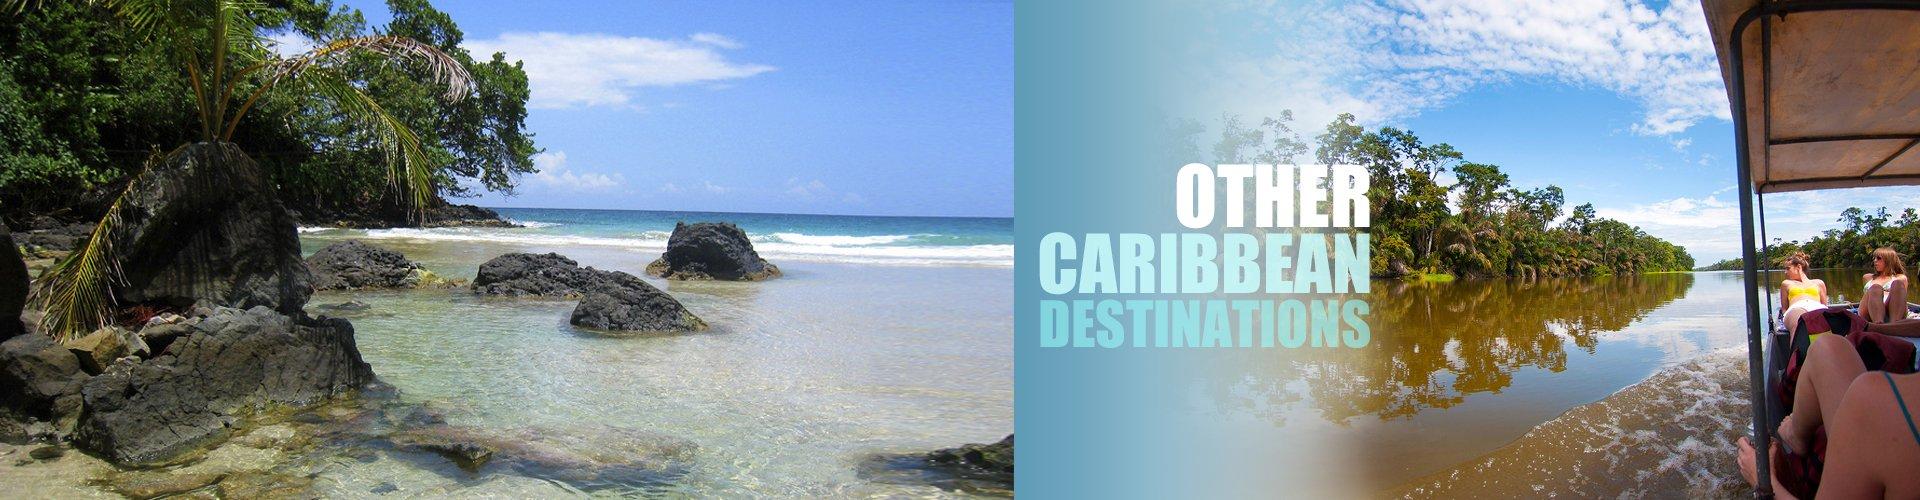 Other Caribbean Destinations